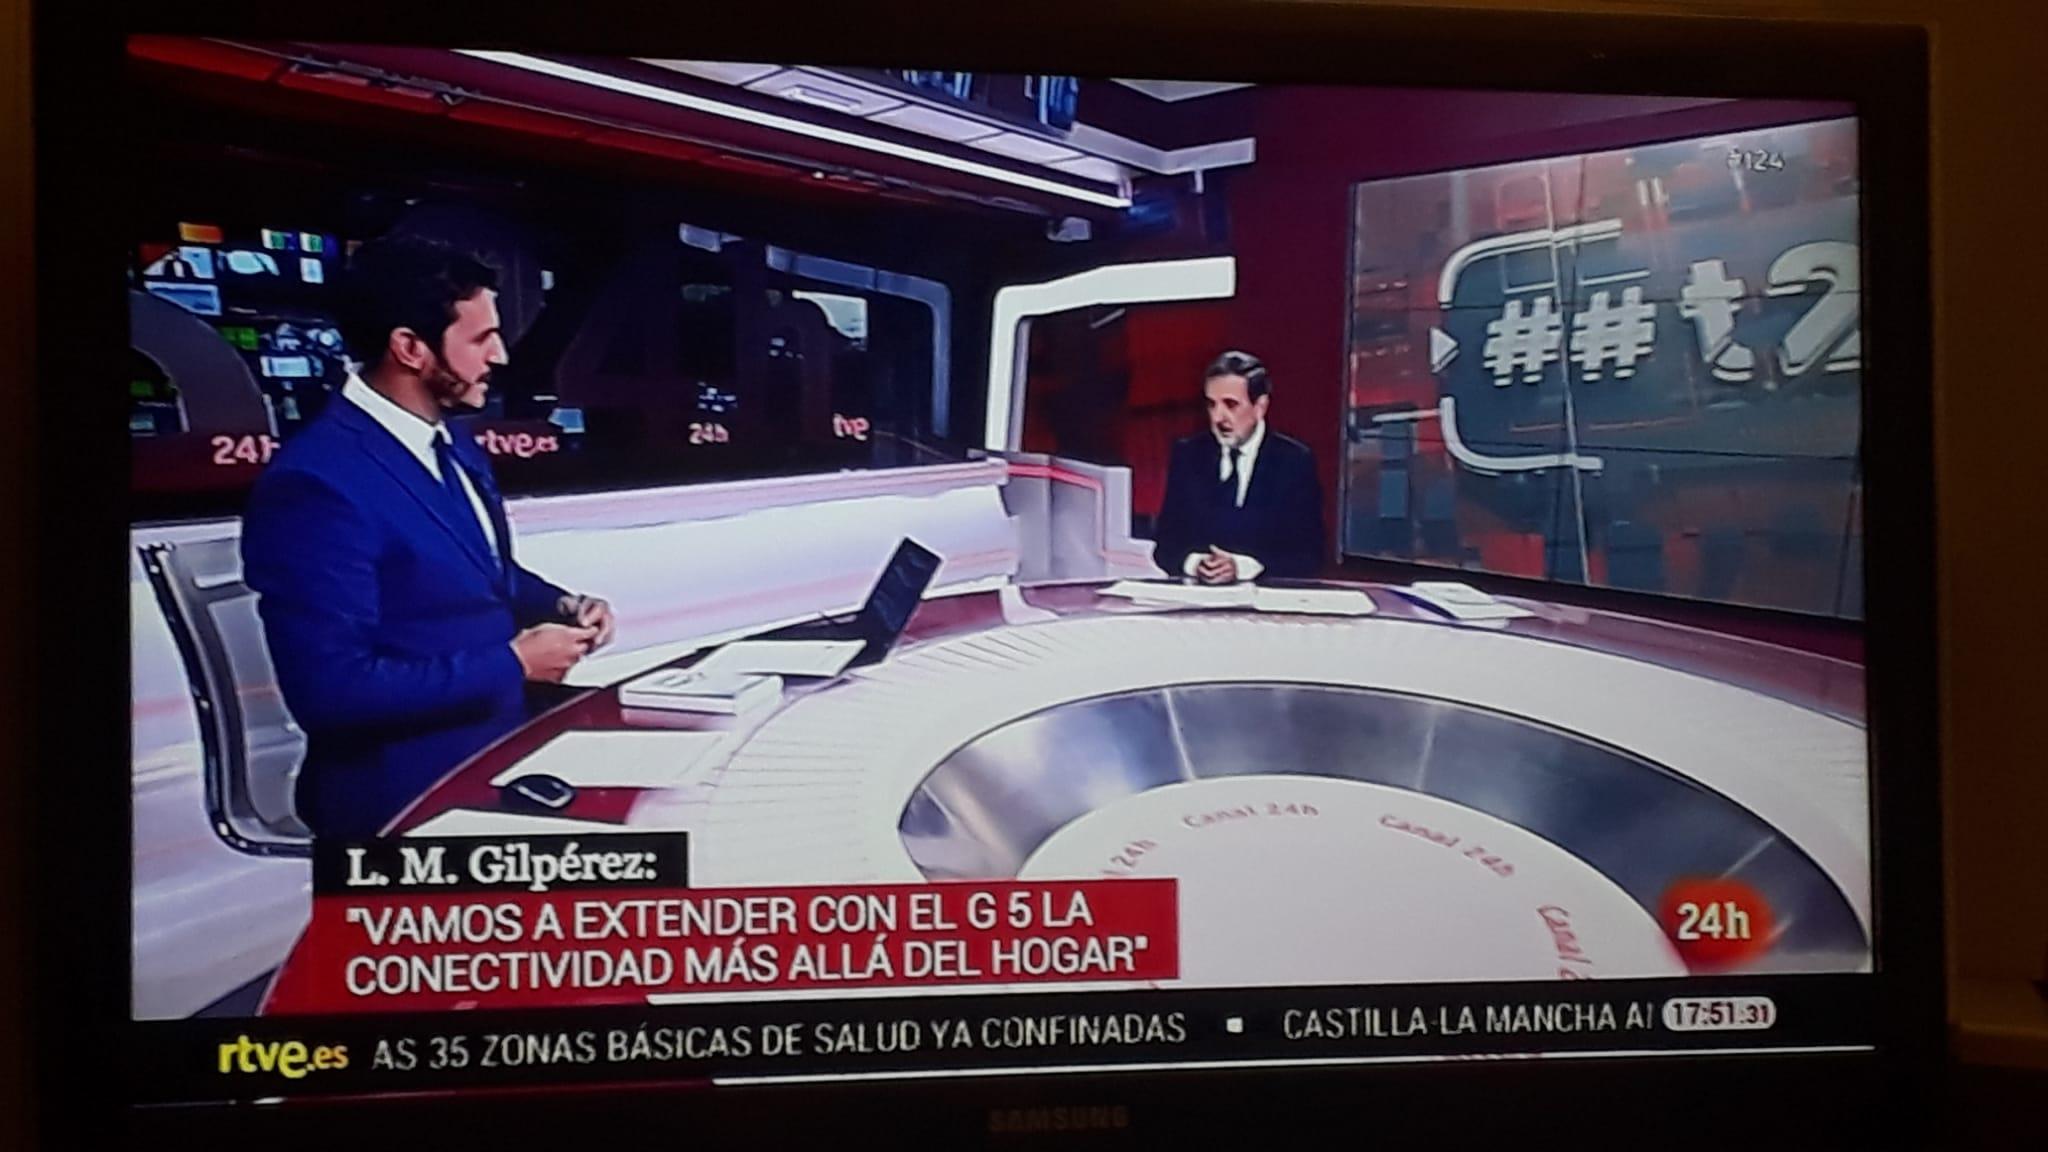 Luis Miguel Gilperez